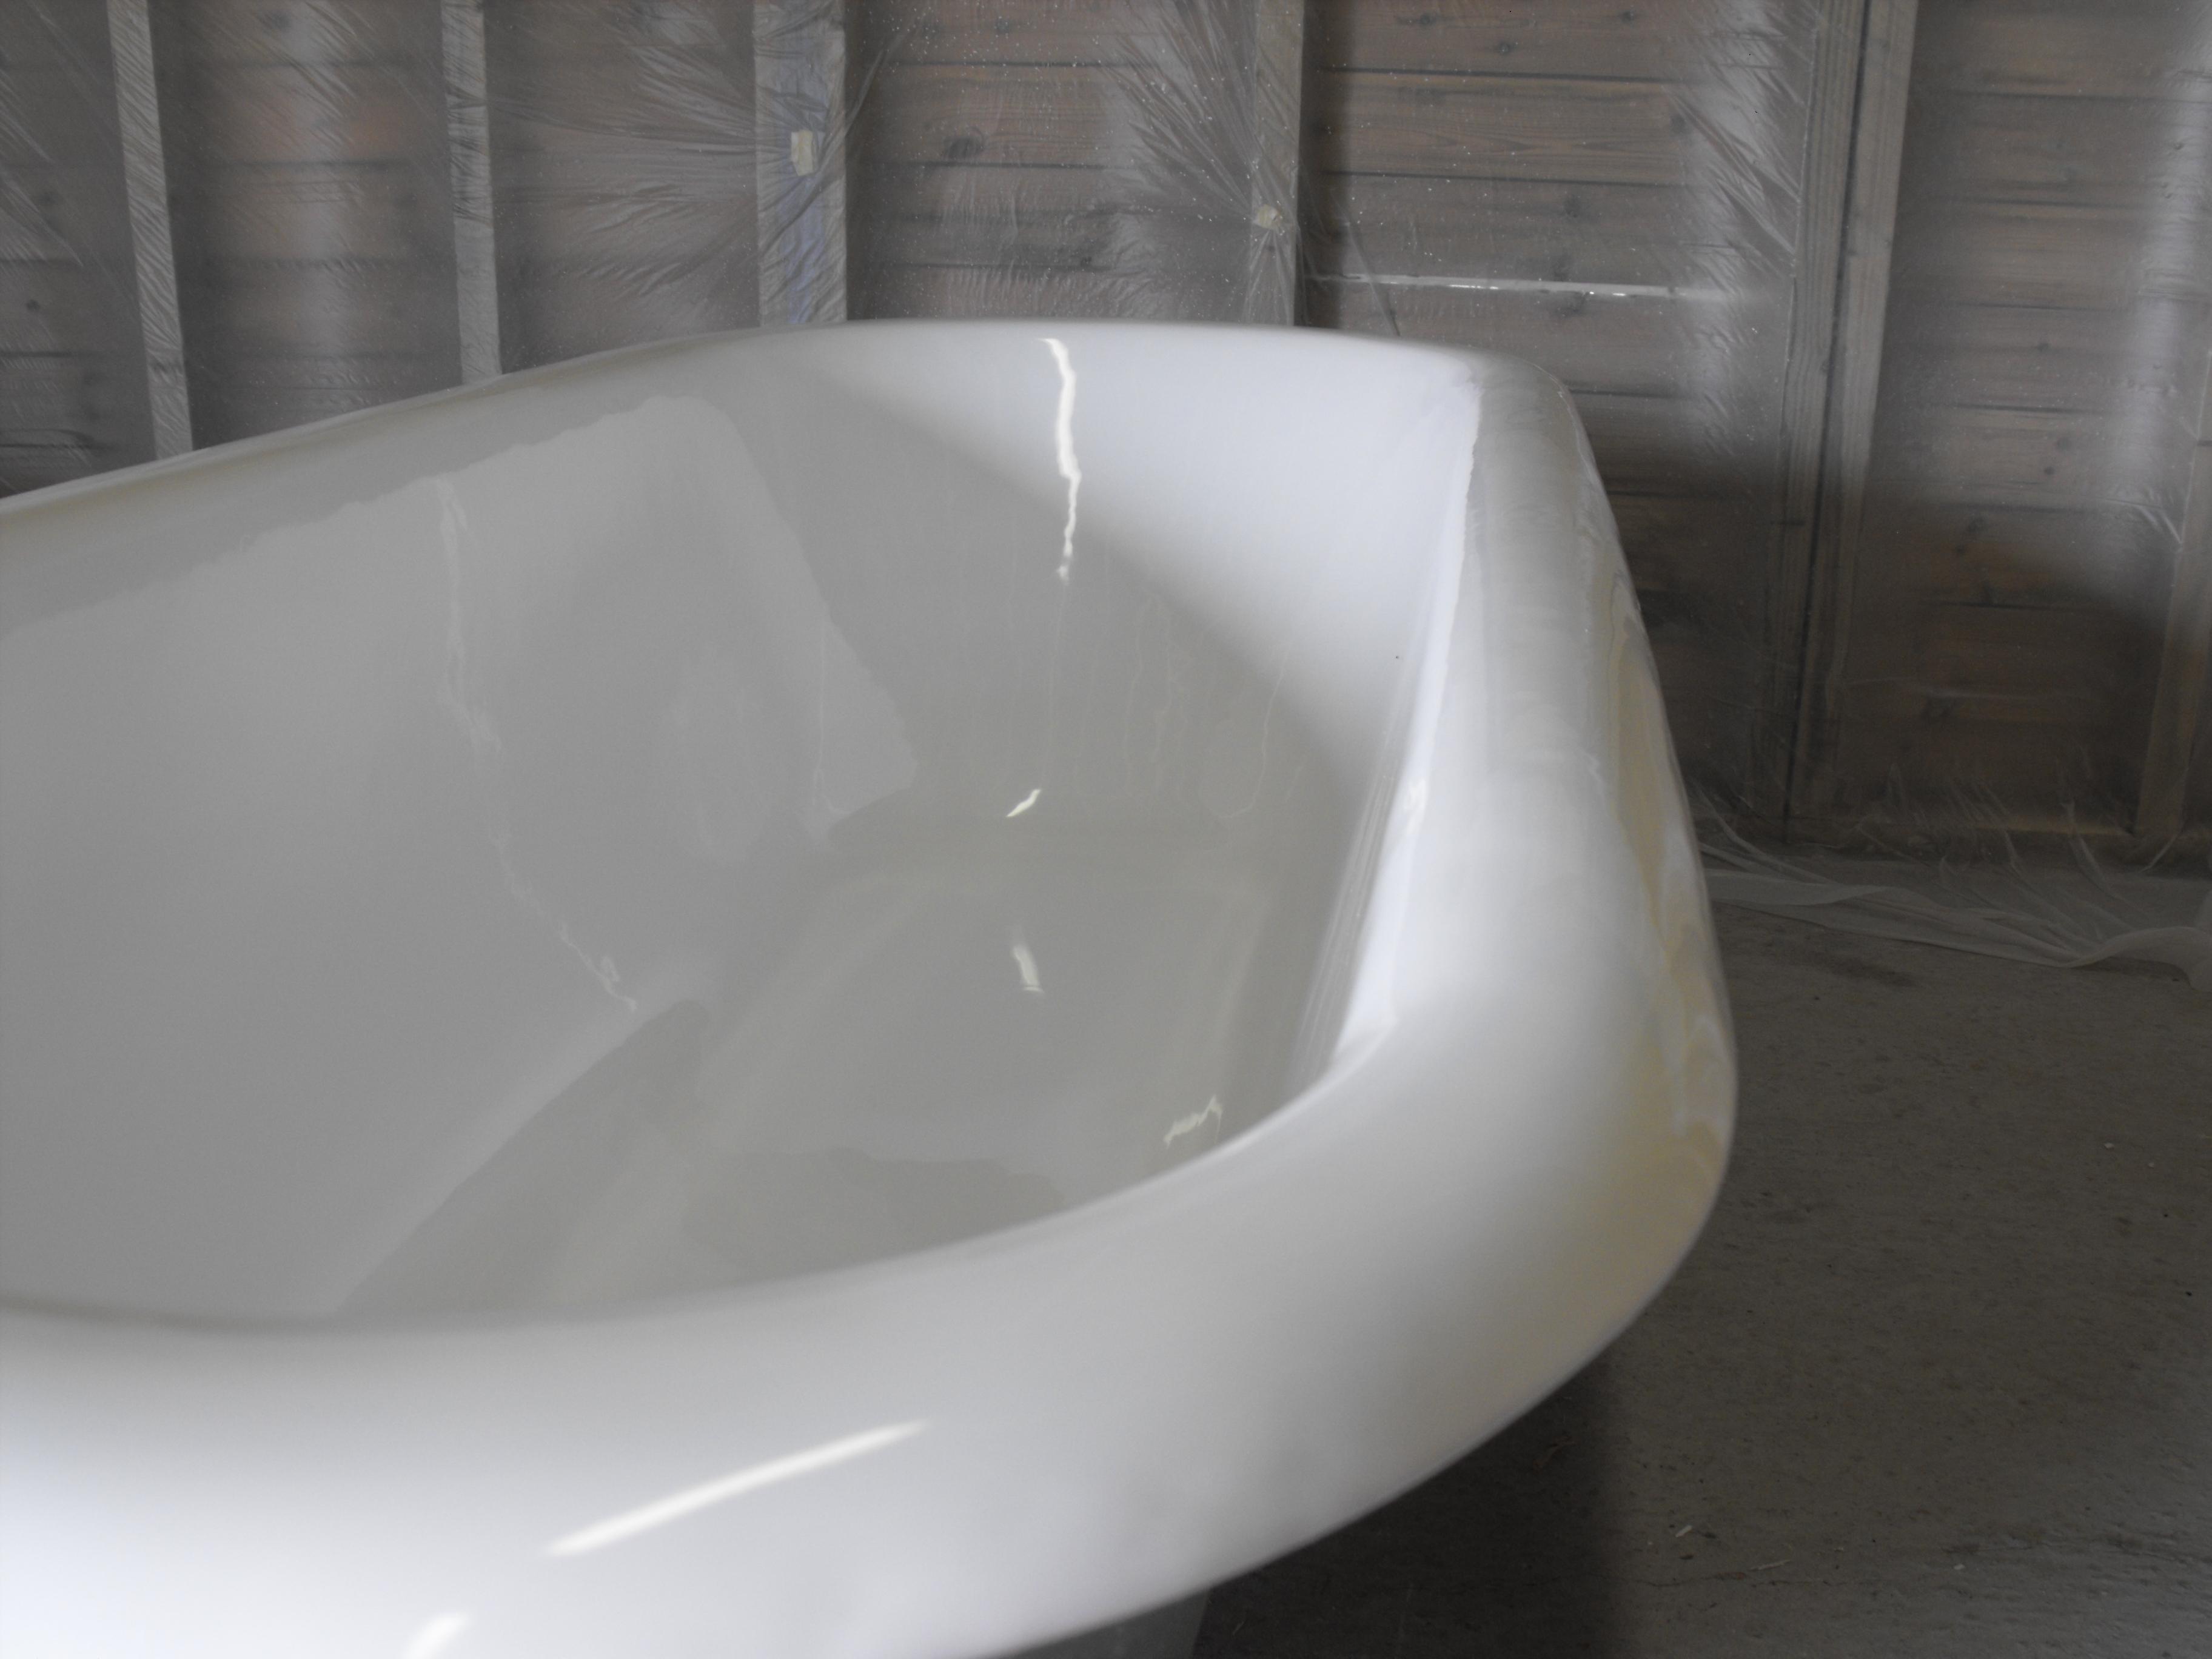 Charming Cast Iron Bath Resurfacing Ideas The Best